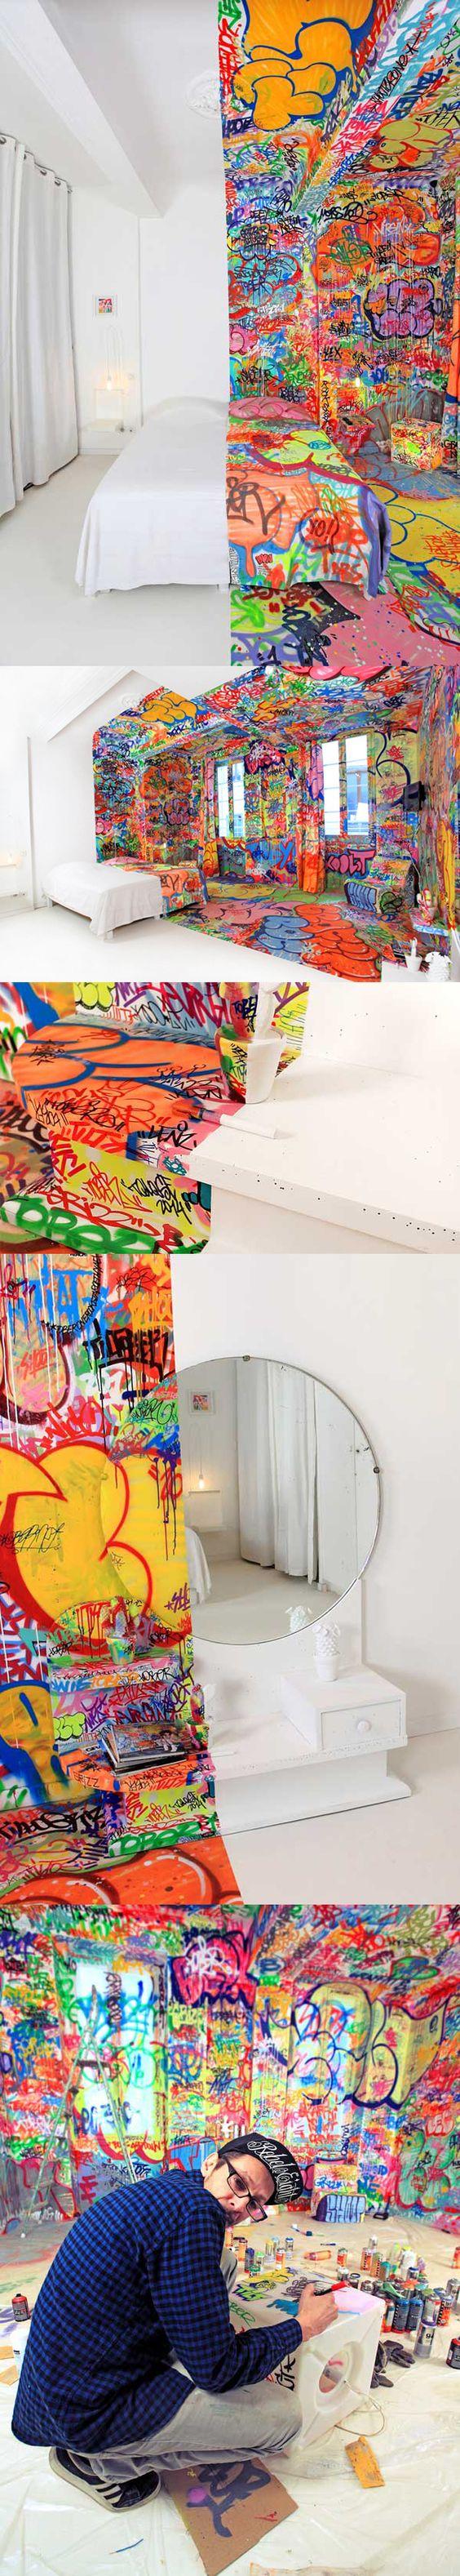 tilt panic room design urban and dream bedroom on simply wall street id=43990